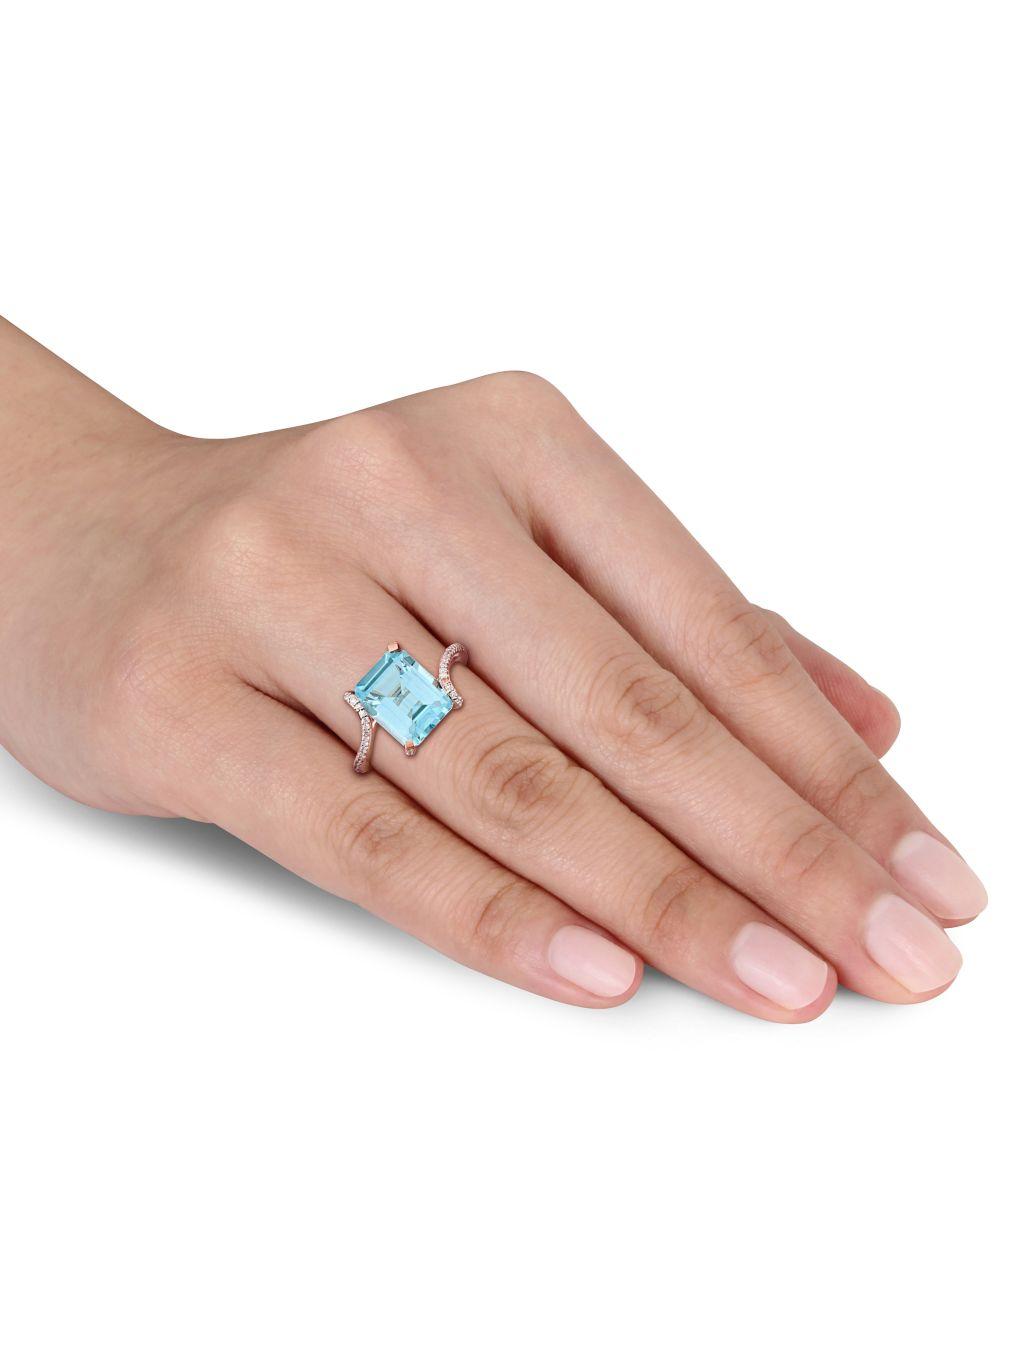 Sonatina 14K Rose Gold, Sky Blue Topaz & Diamond Bypass Cocktail Ring